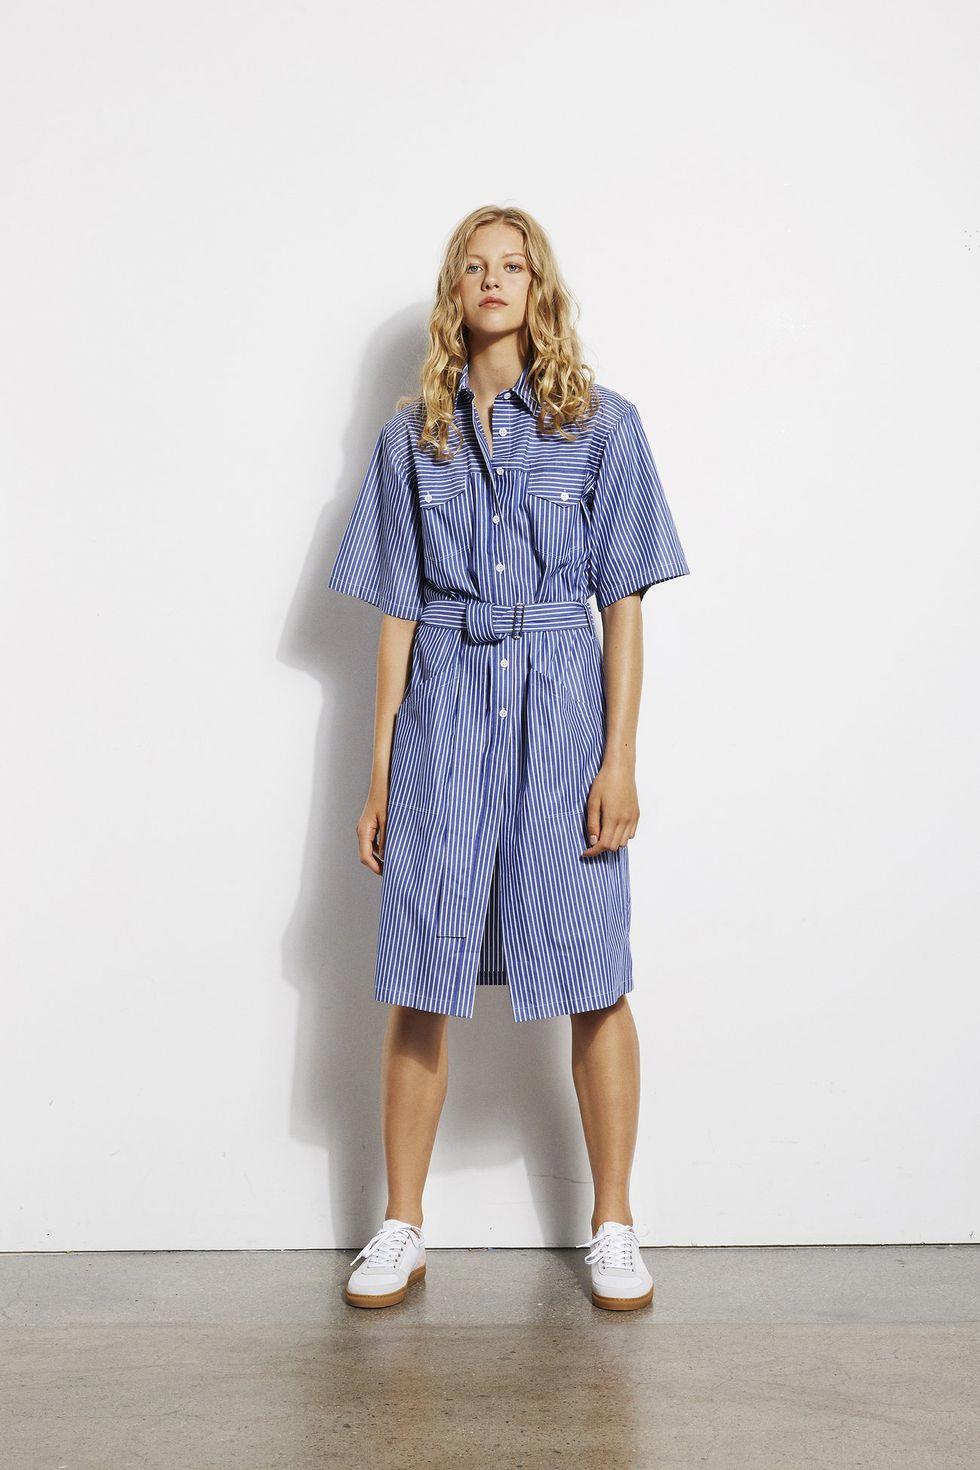 Mads Norgaard Fallfashionforworktips In 2020 Scandinavian Fashion Women Scandinavian Fashion Feminist Fashion